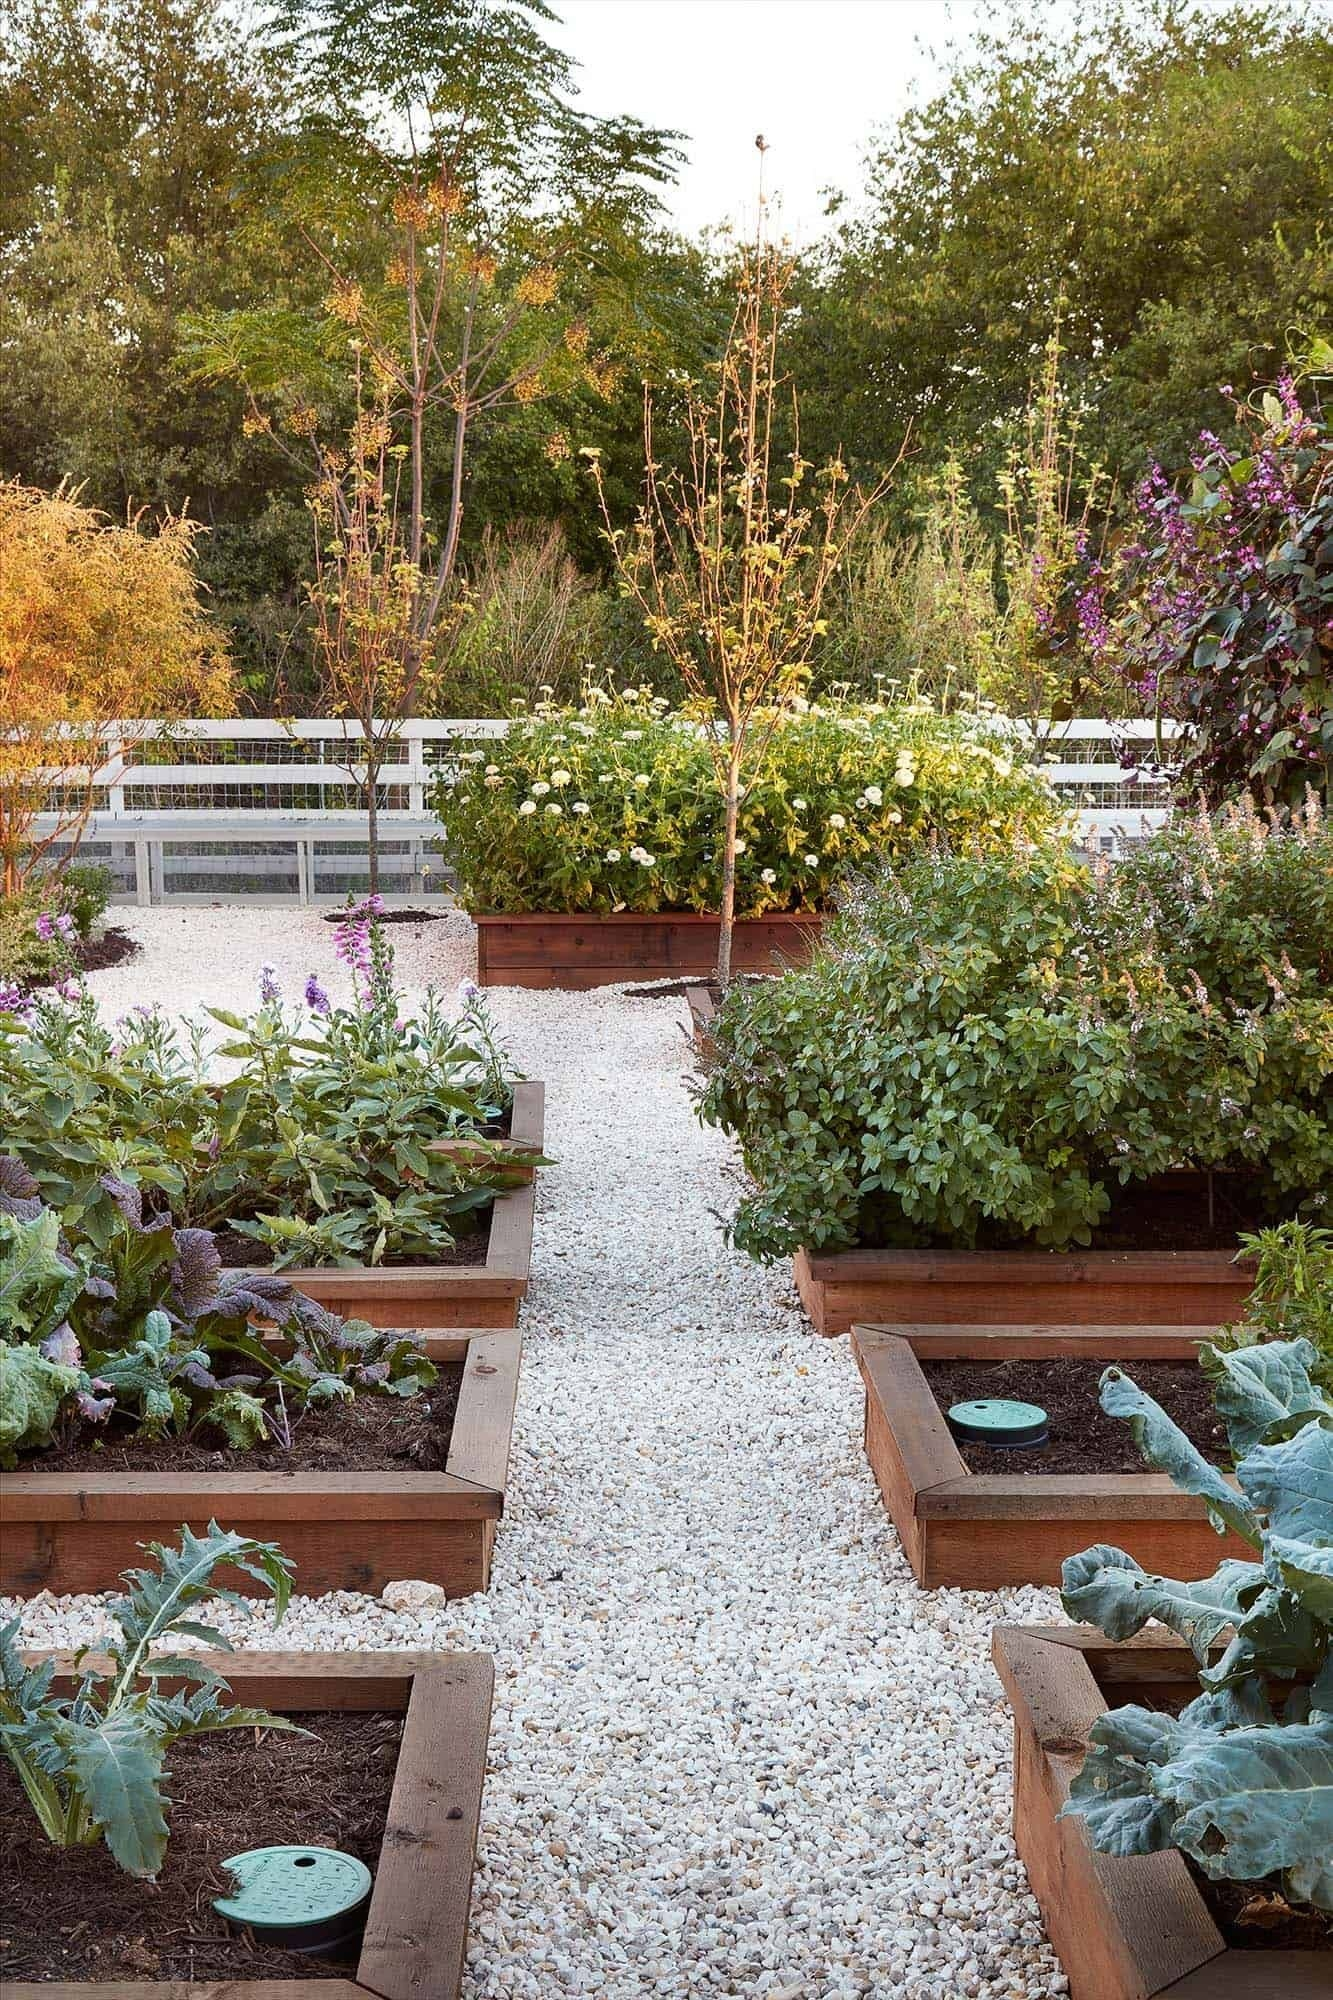 Rustic Vegetable Garden Design Ideas For Your Backyard Inspiration 34